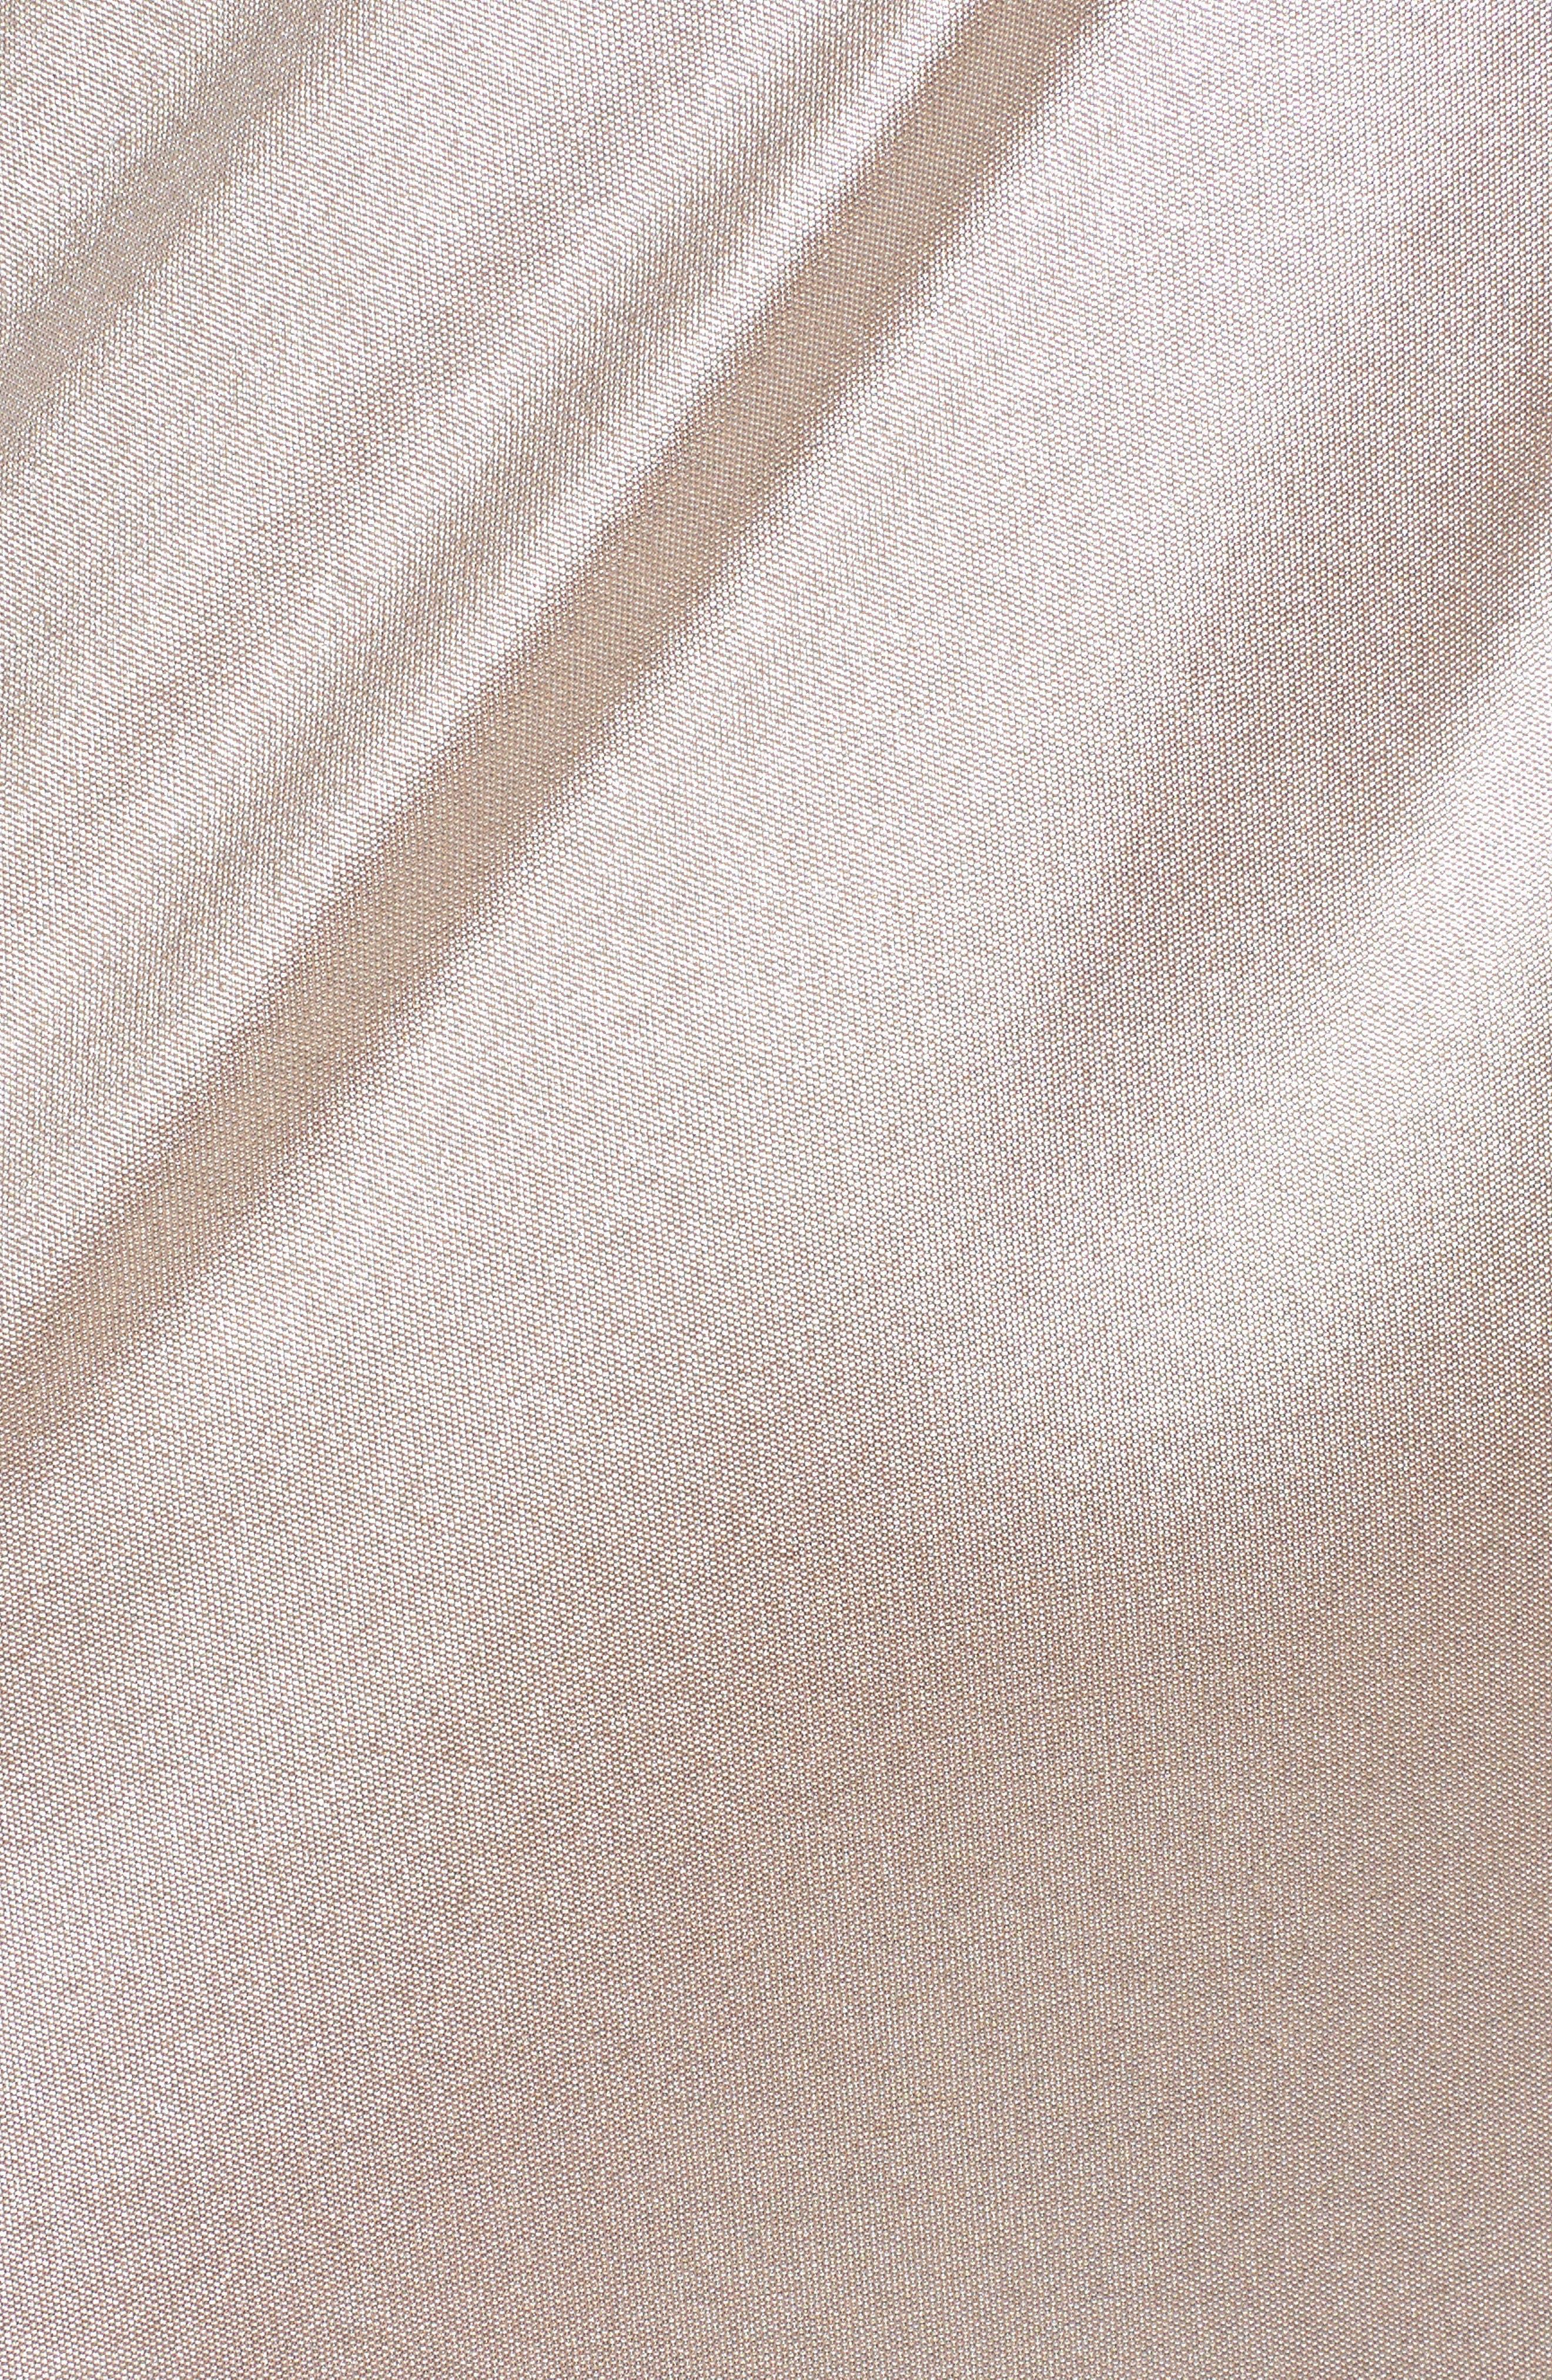 Director's Cut Dress,                             Alternate thumbnail 5, color,                             Rose Gold